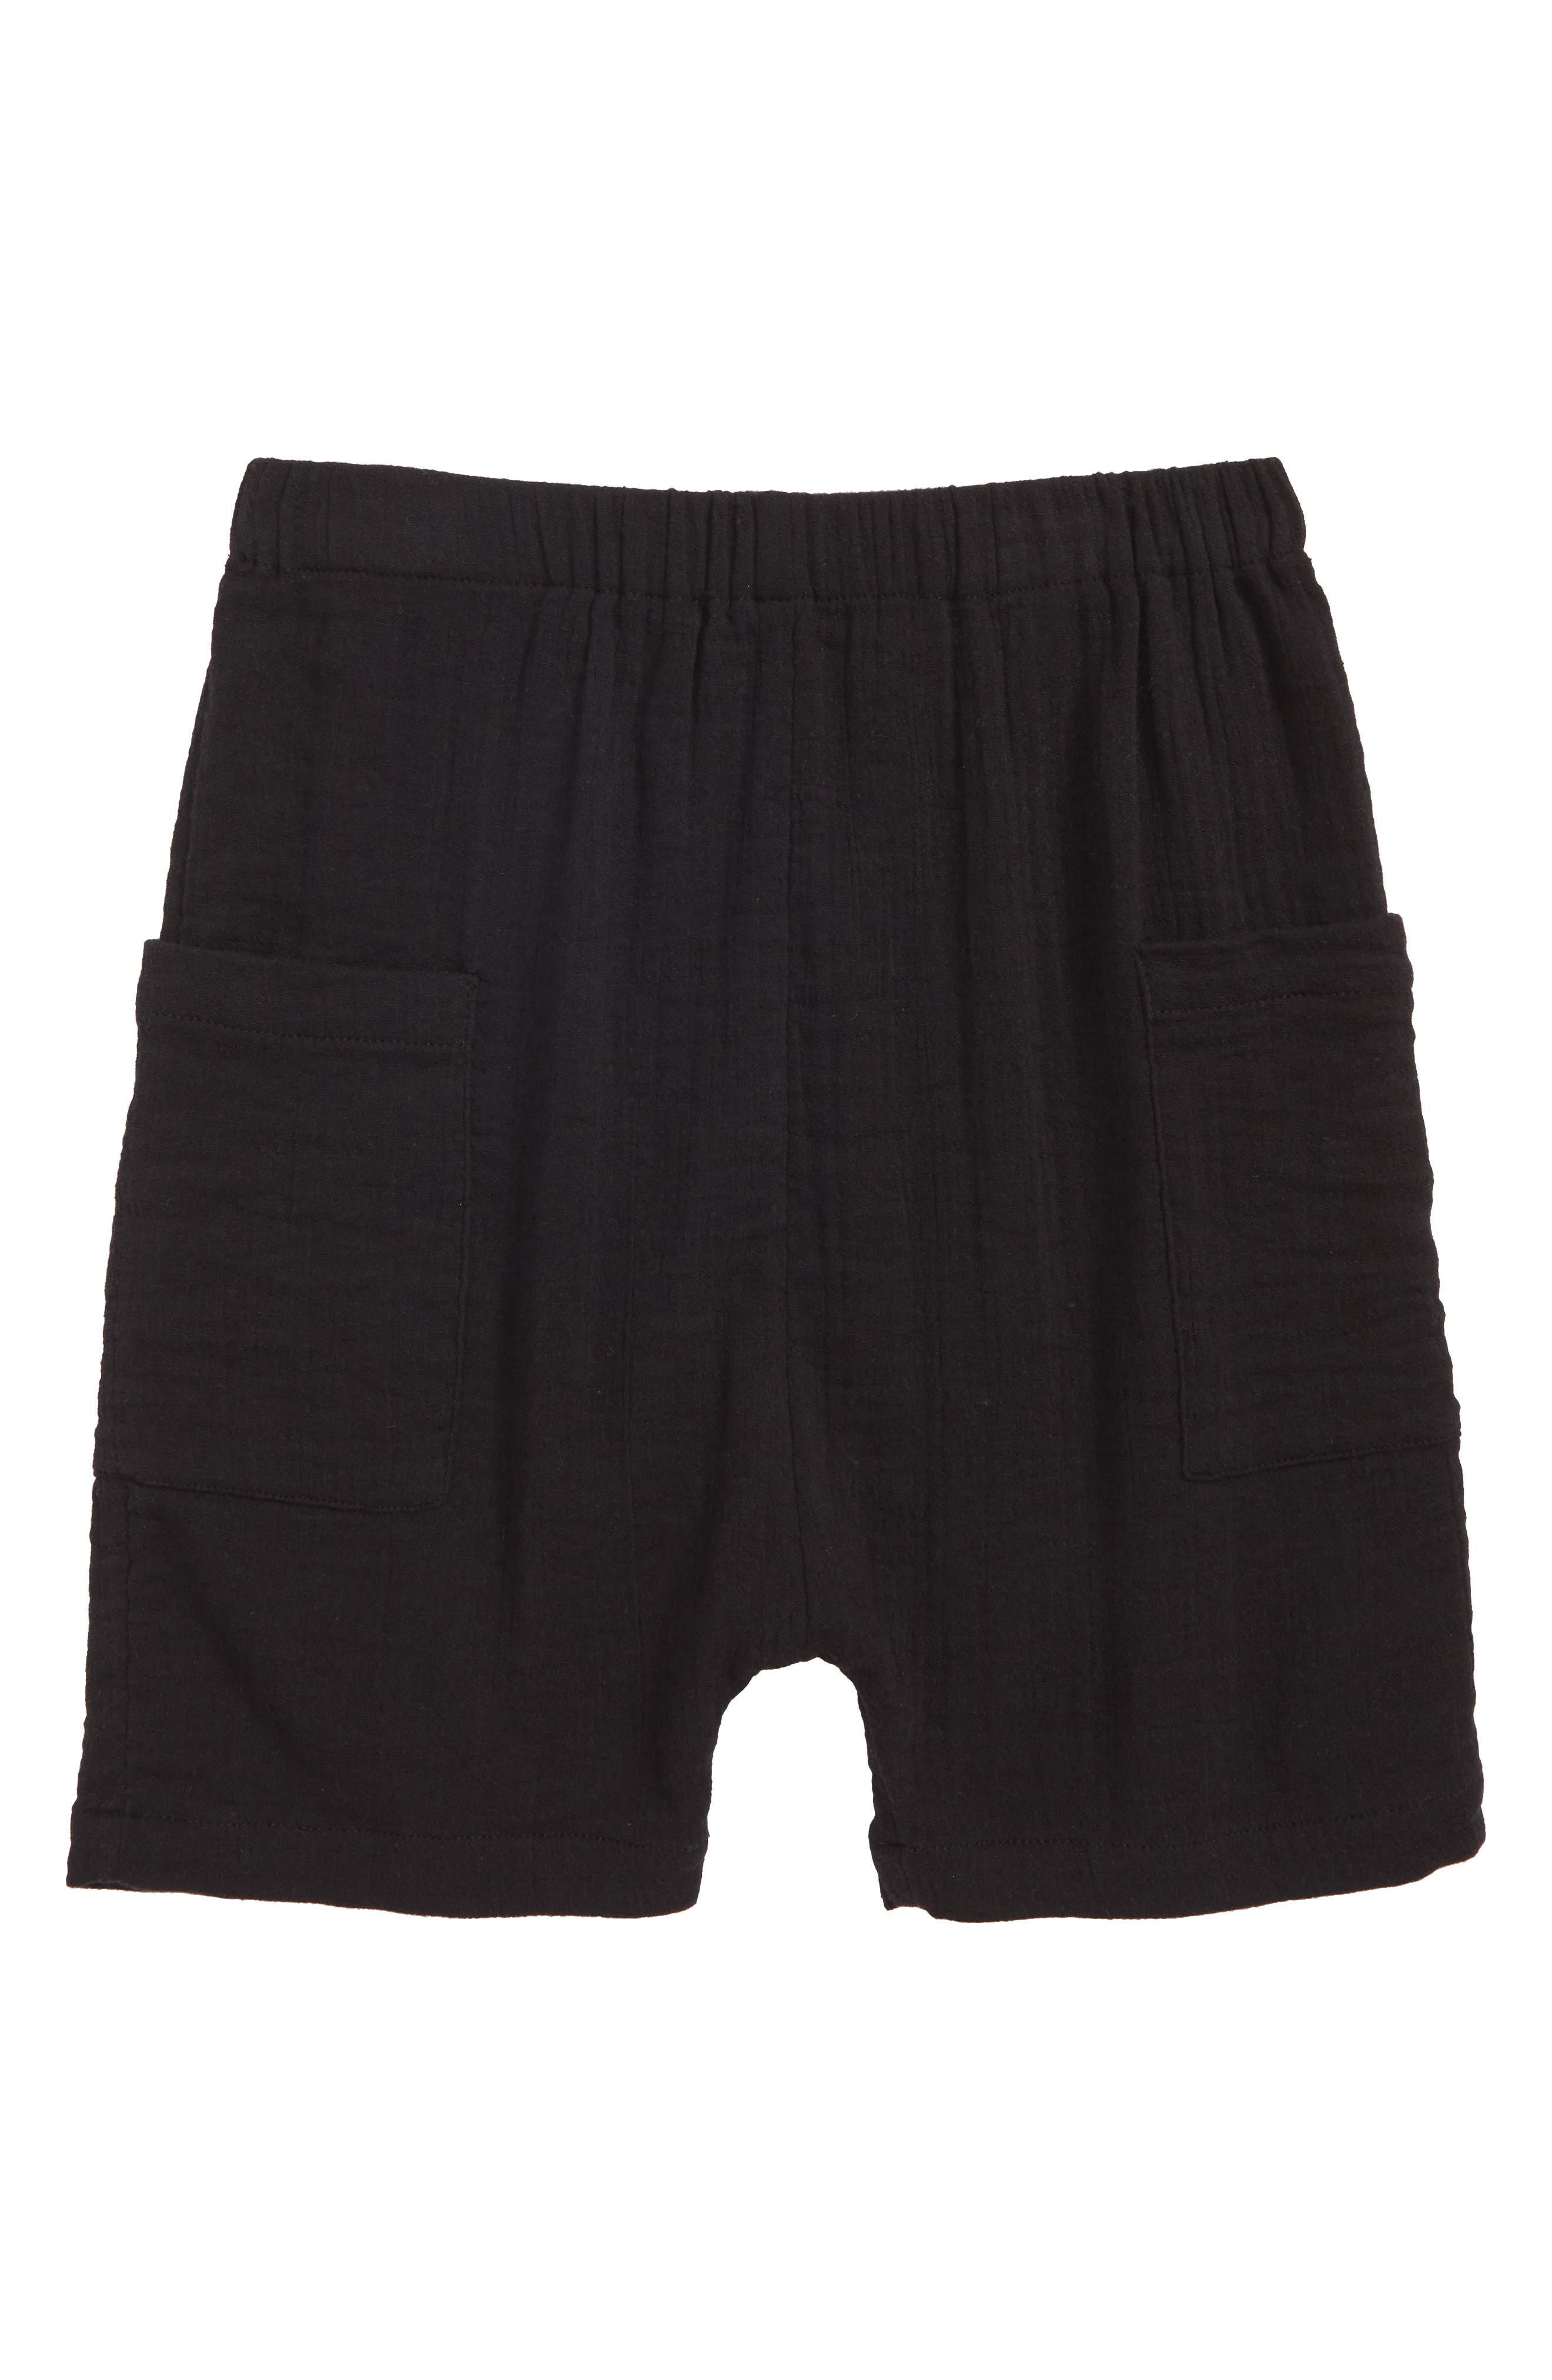 Textured Pocket Shorts,                         Main,                         color, Black